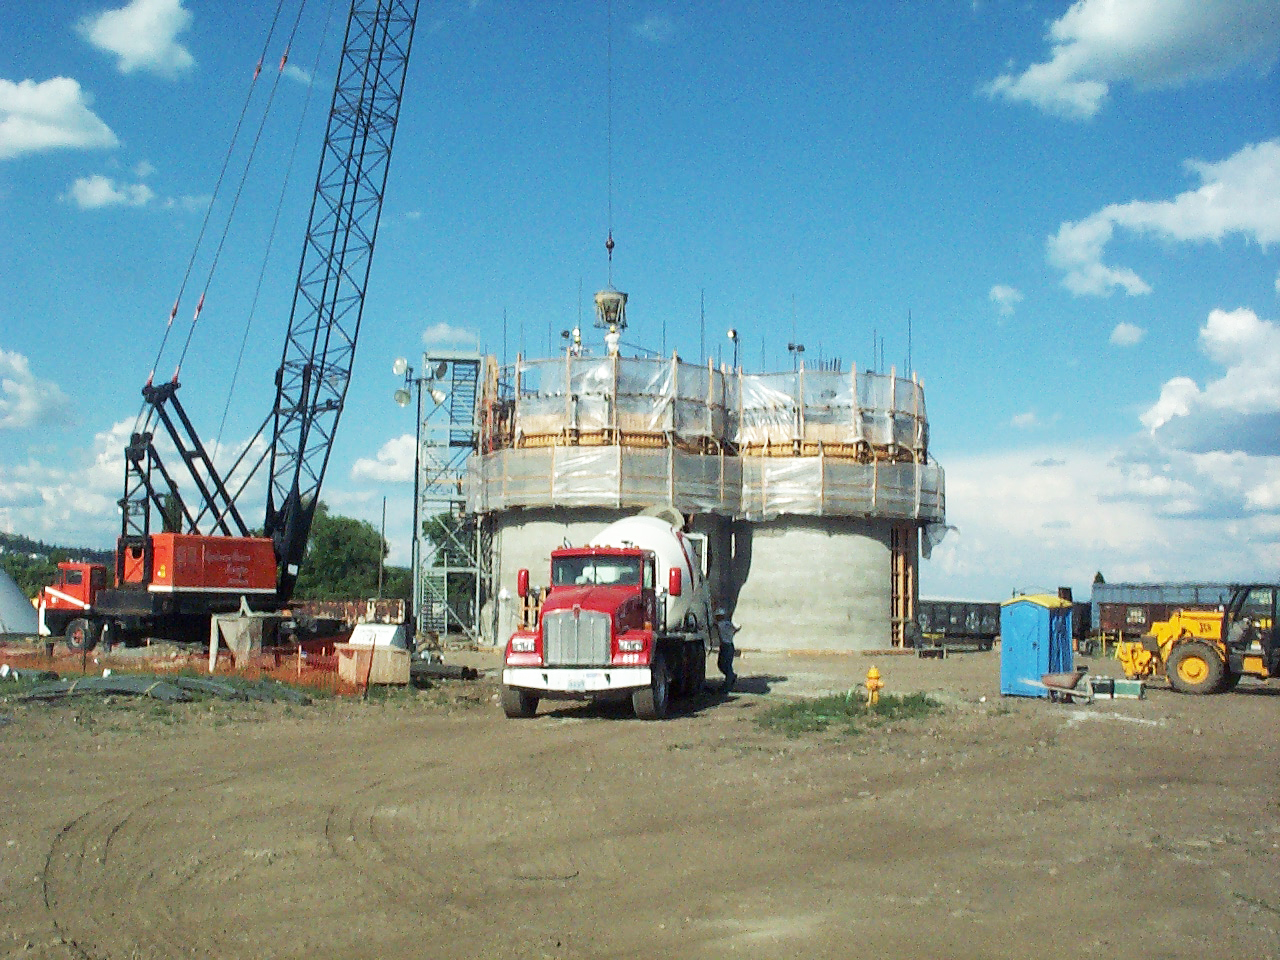 Spokane_1 5650 ton slipform concrete storage structure Ag-industrial Industrial Slipform Rail receiving Truck unload Silo aeration